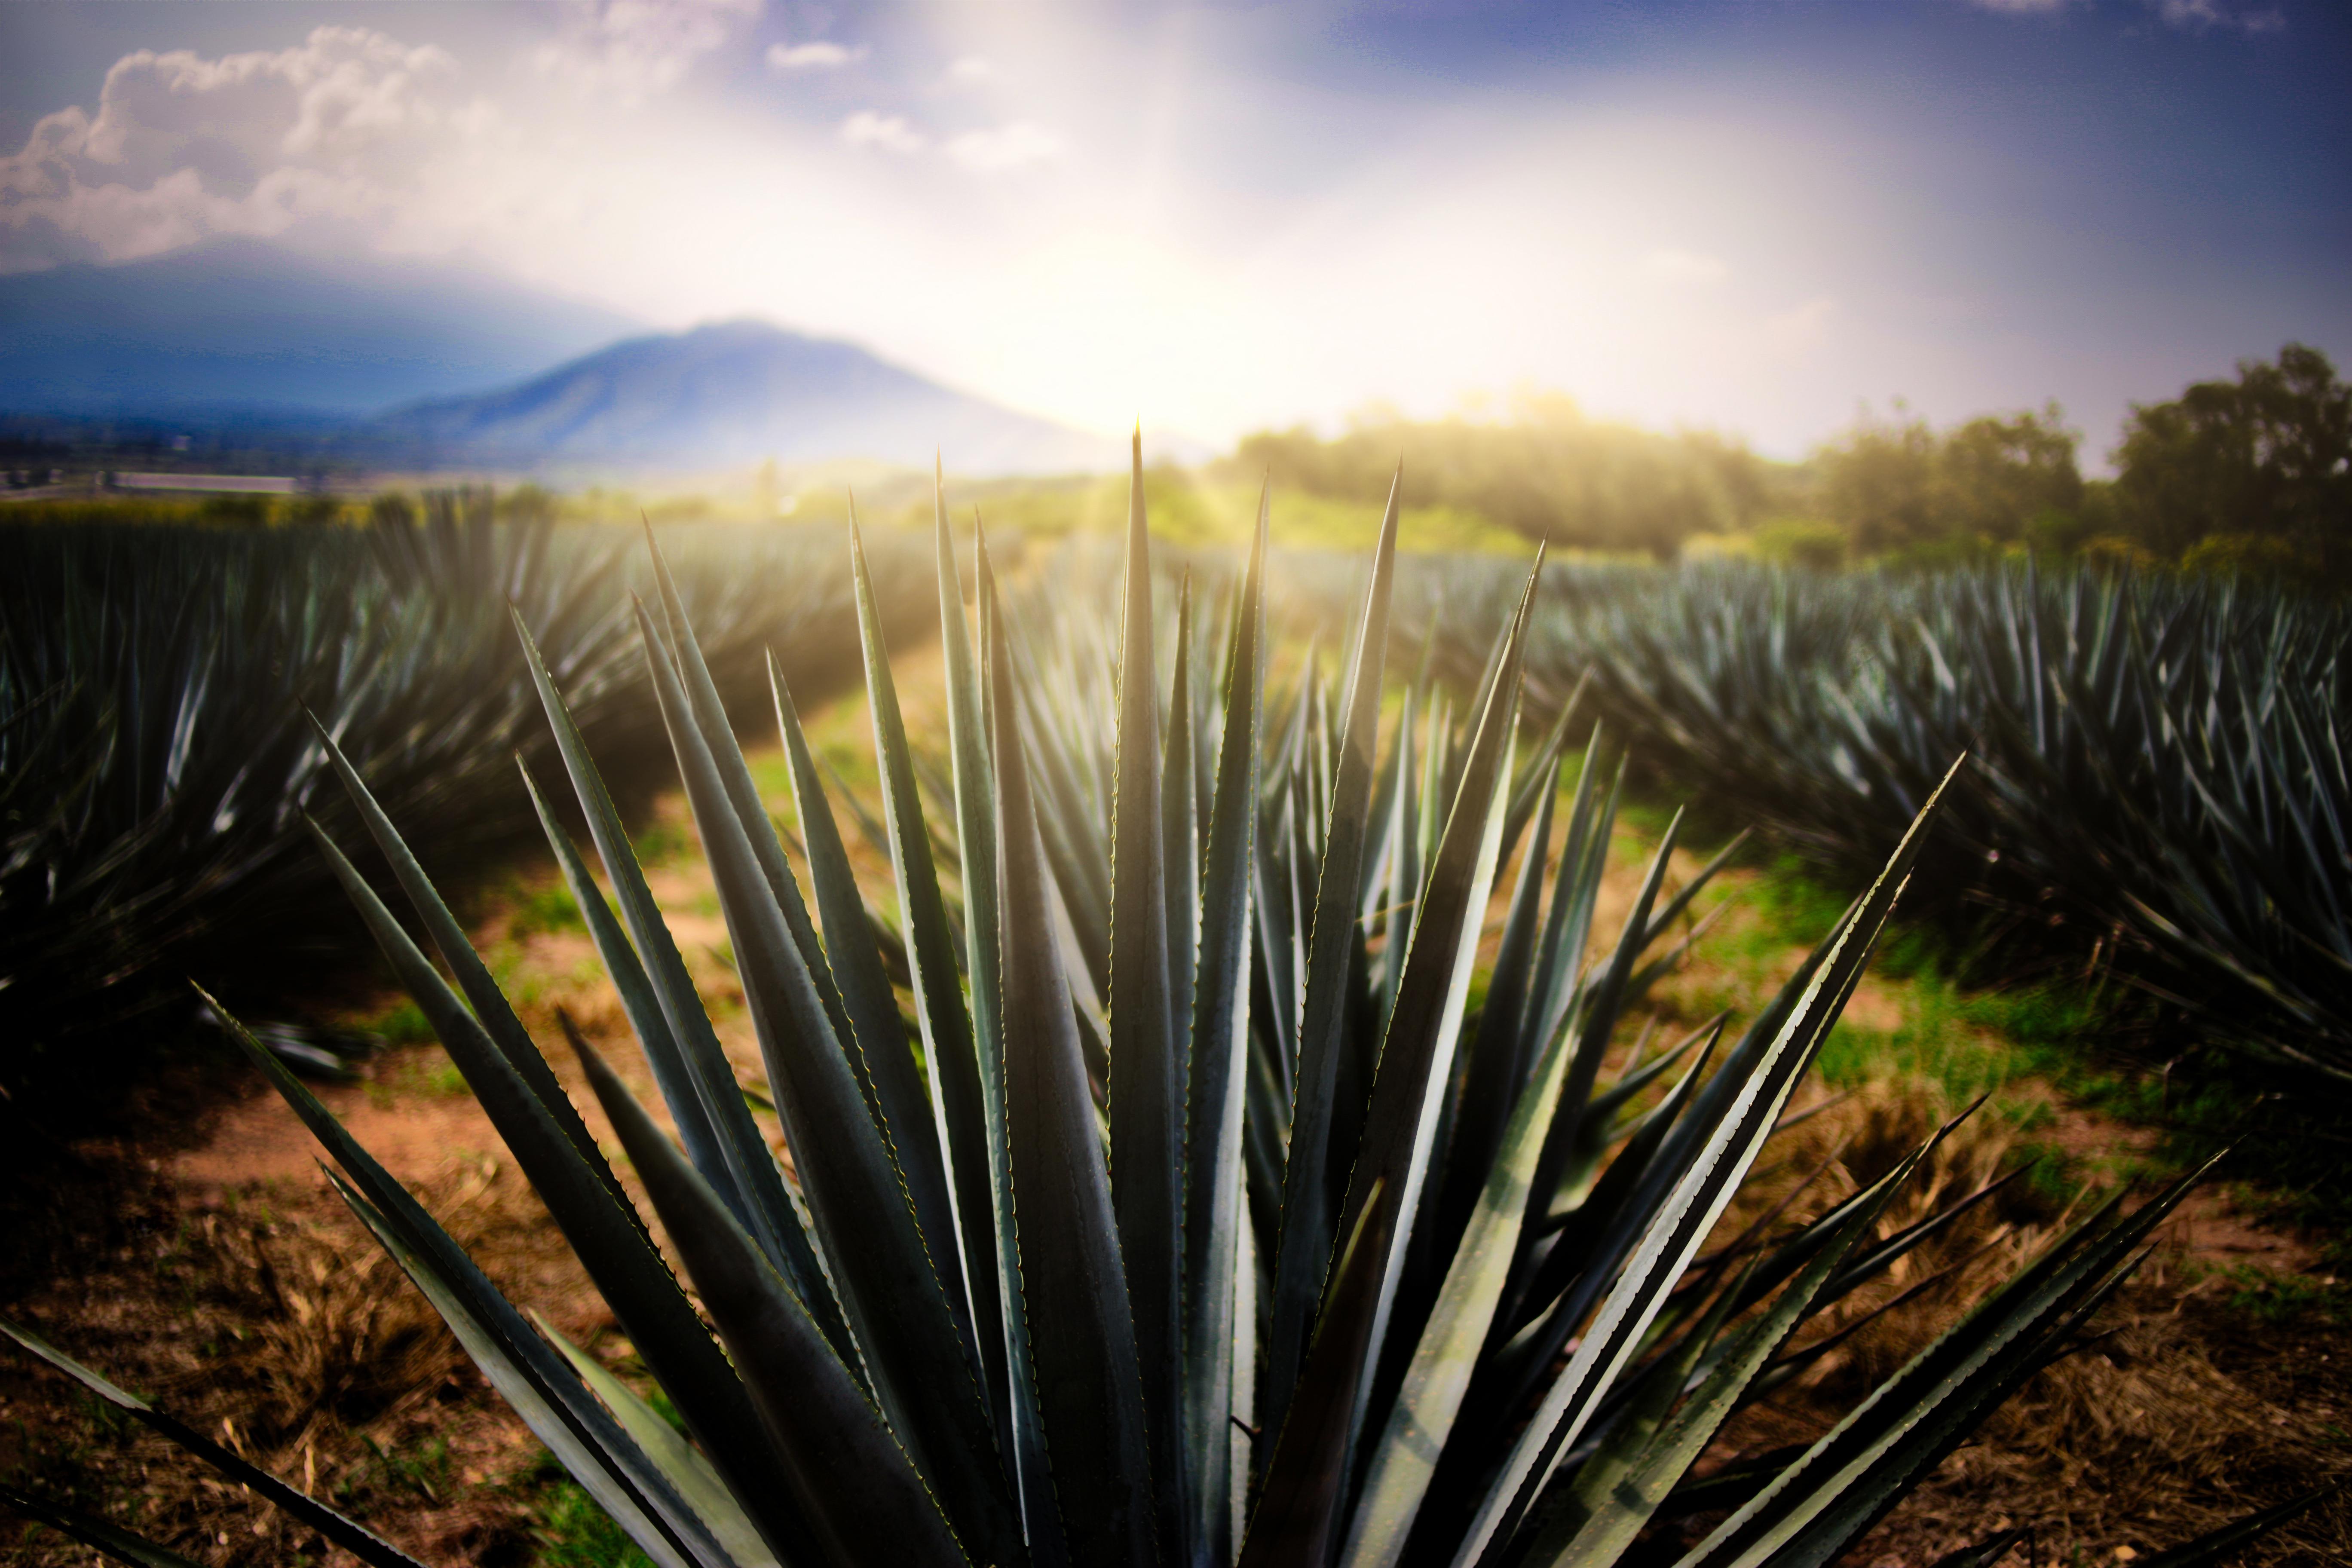 Tequila recibe certificación como primer Destino Turístico Inteligente de México y América Latina